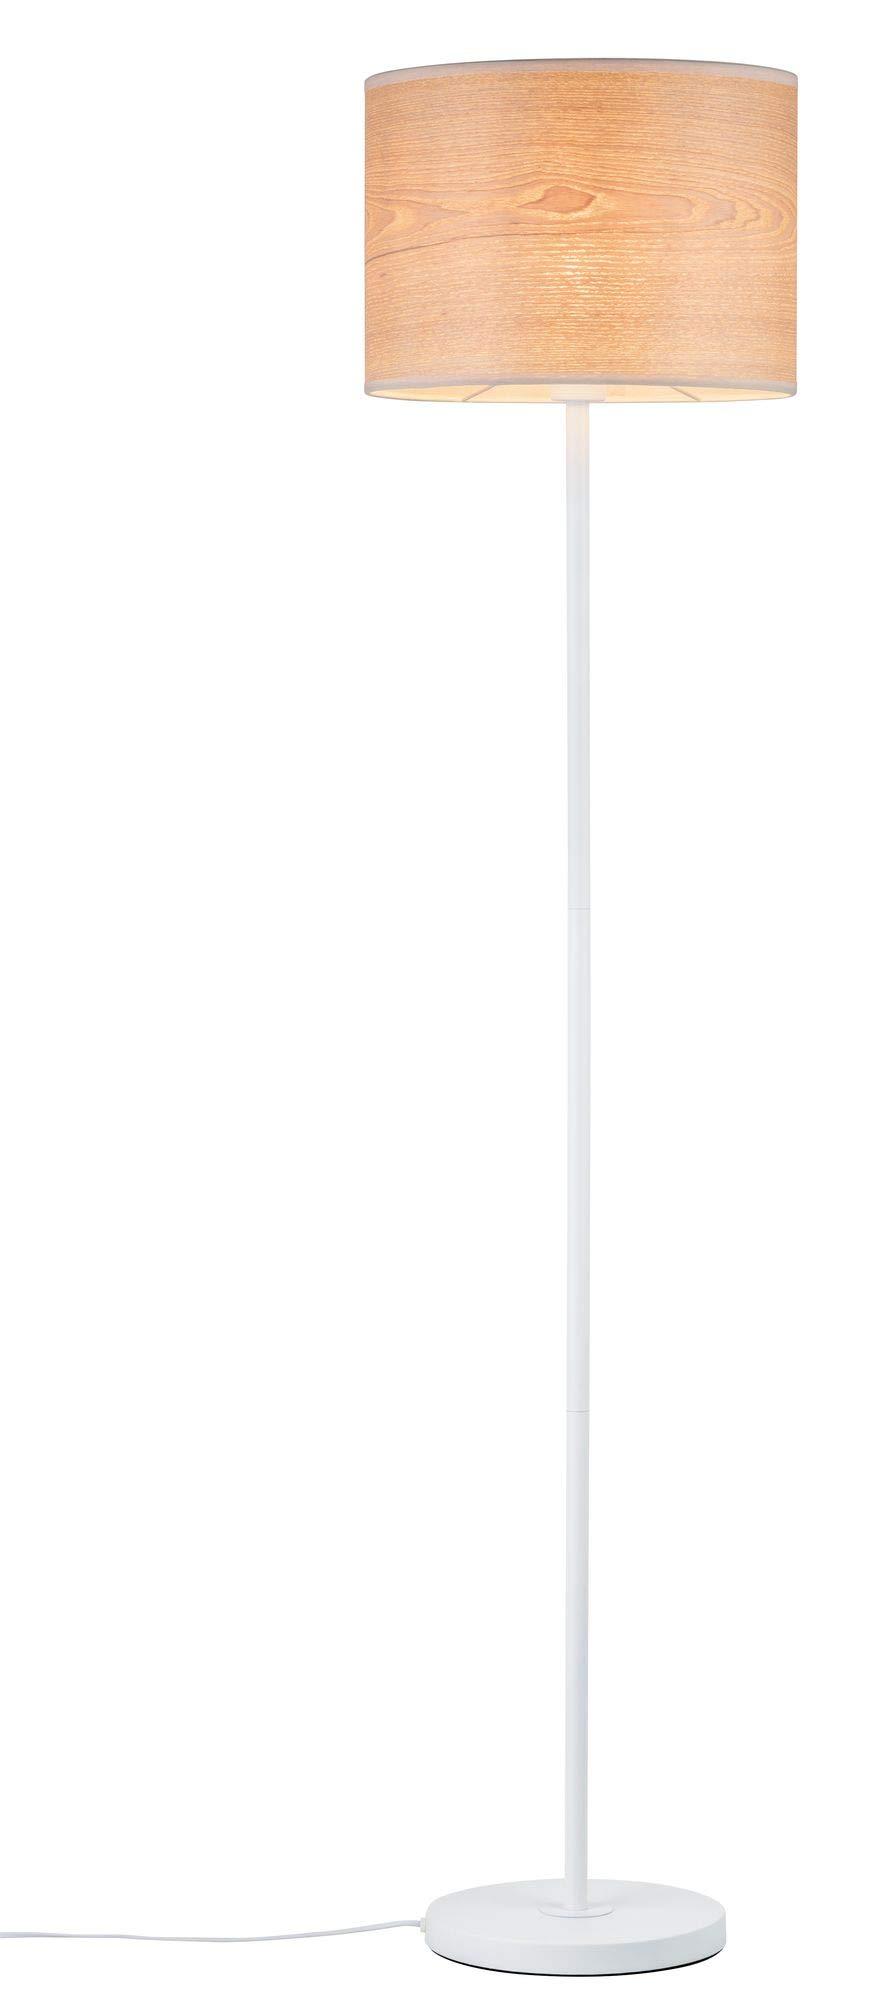 Full Size of Ikea Stehlampe Holz Regal Naturholz Massivholz Esstisch Küche Modern Holzhaus Garten Betten Bei Wohnzimmer Schlafzimmer Komplett Alu Fenster Massivholzküche Wohnzimmer Ikea Stehlampe Holz